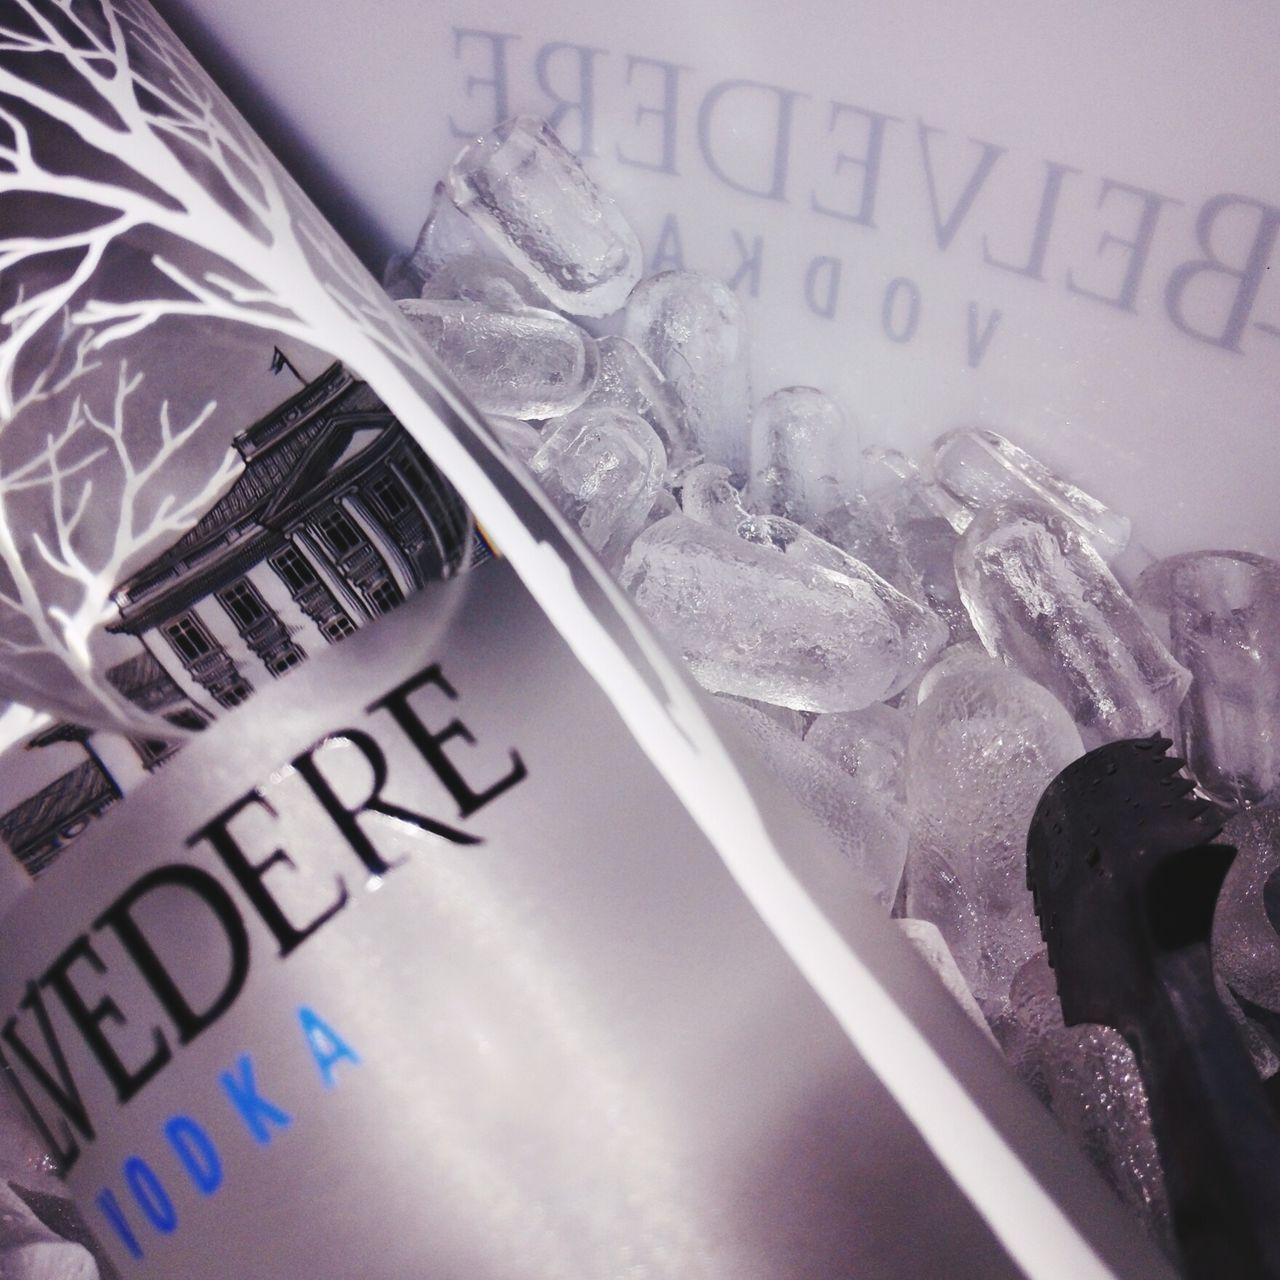 Belvedere Vodka Nightouts 😘👌 Girlsnightout! :) Girls Celebrating Birthday Girl Vodka🍹 Having A Good Time Looking Great Drinking Vodka Belvedere Pure Vodka Magnum